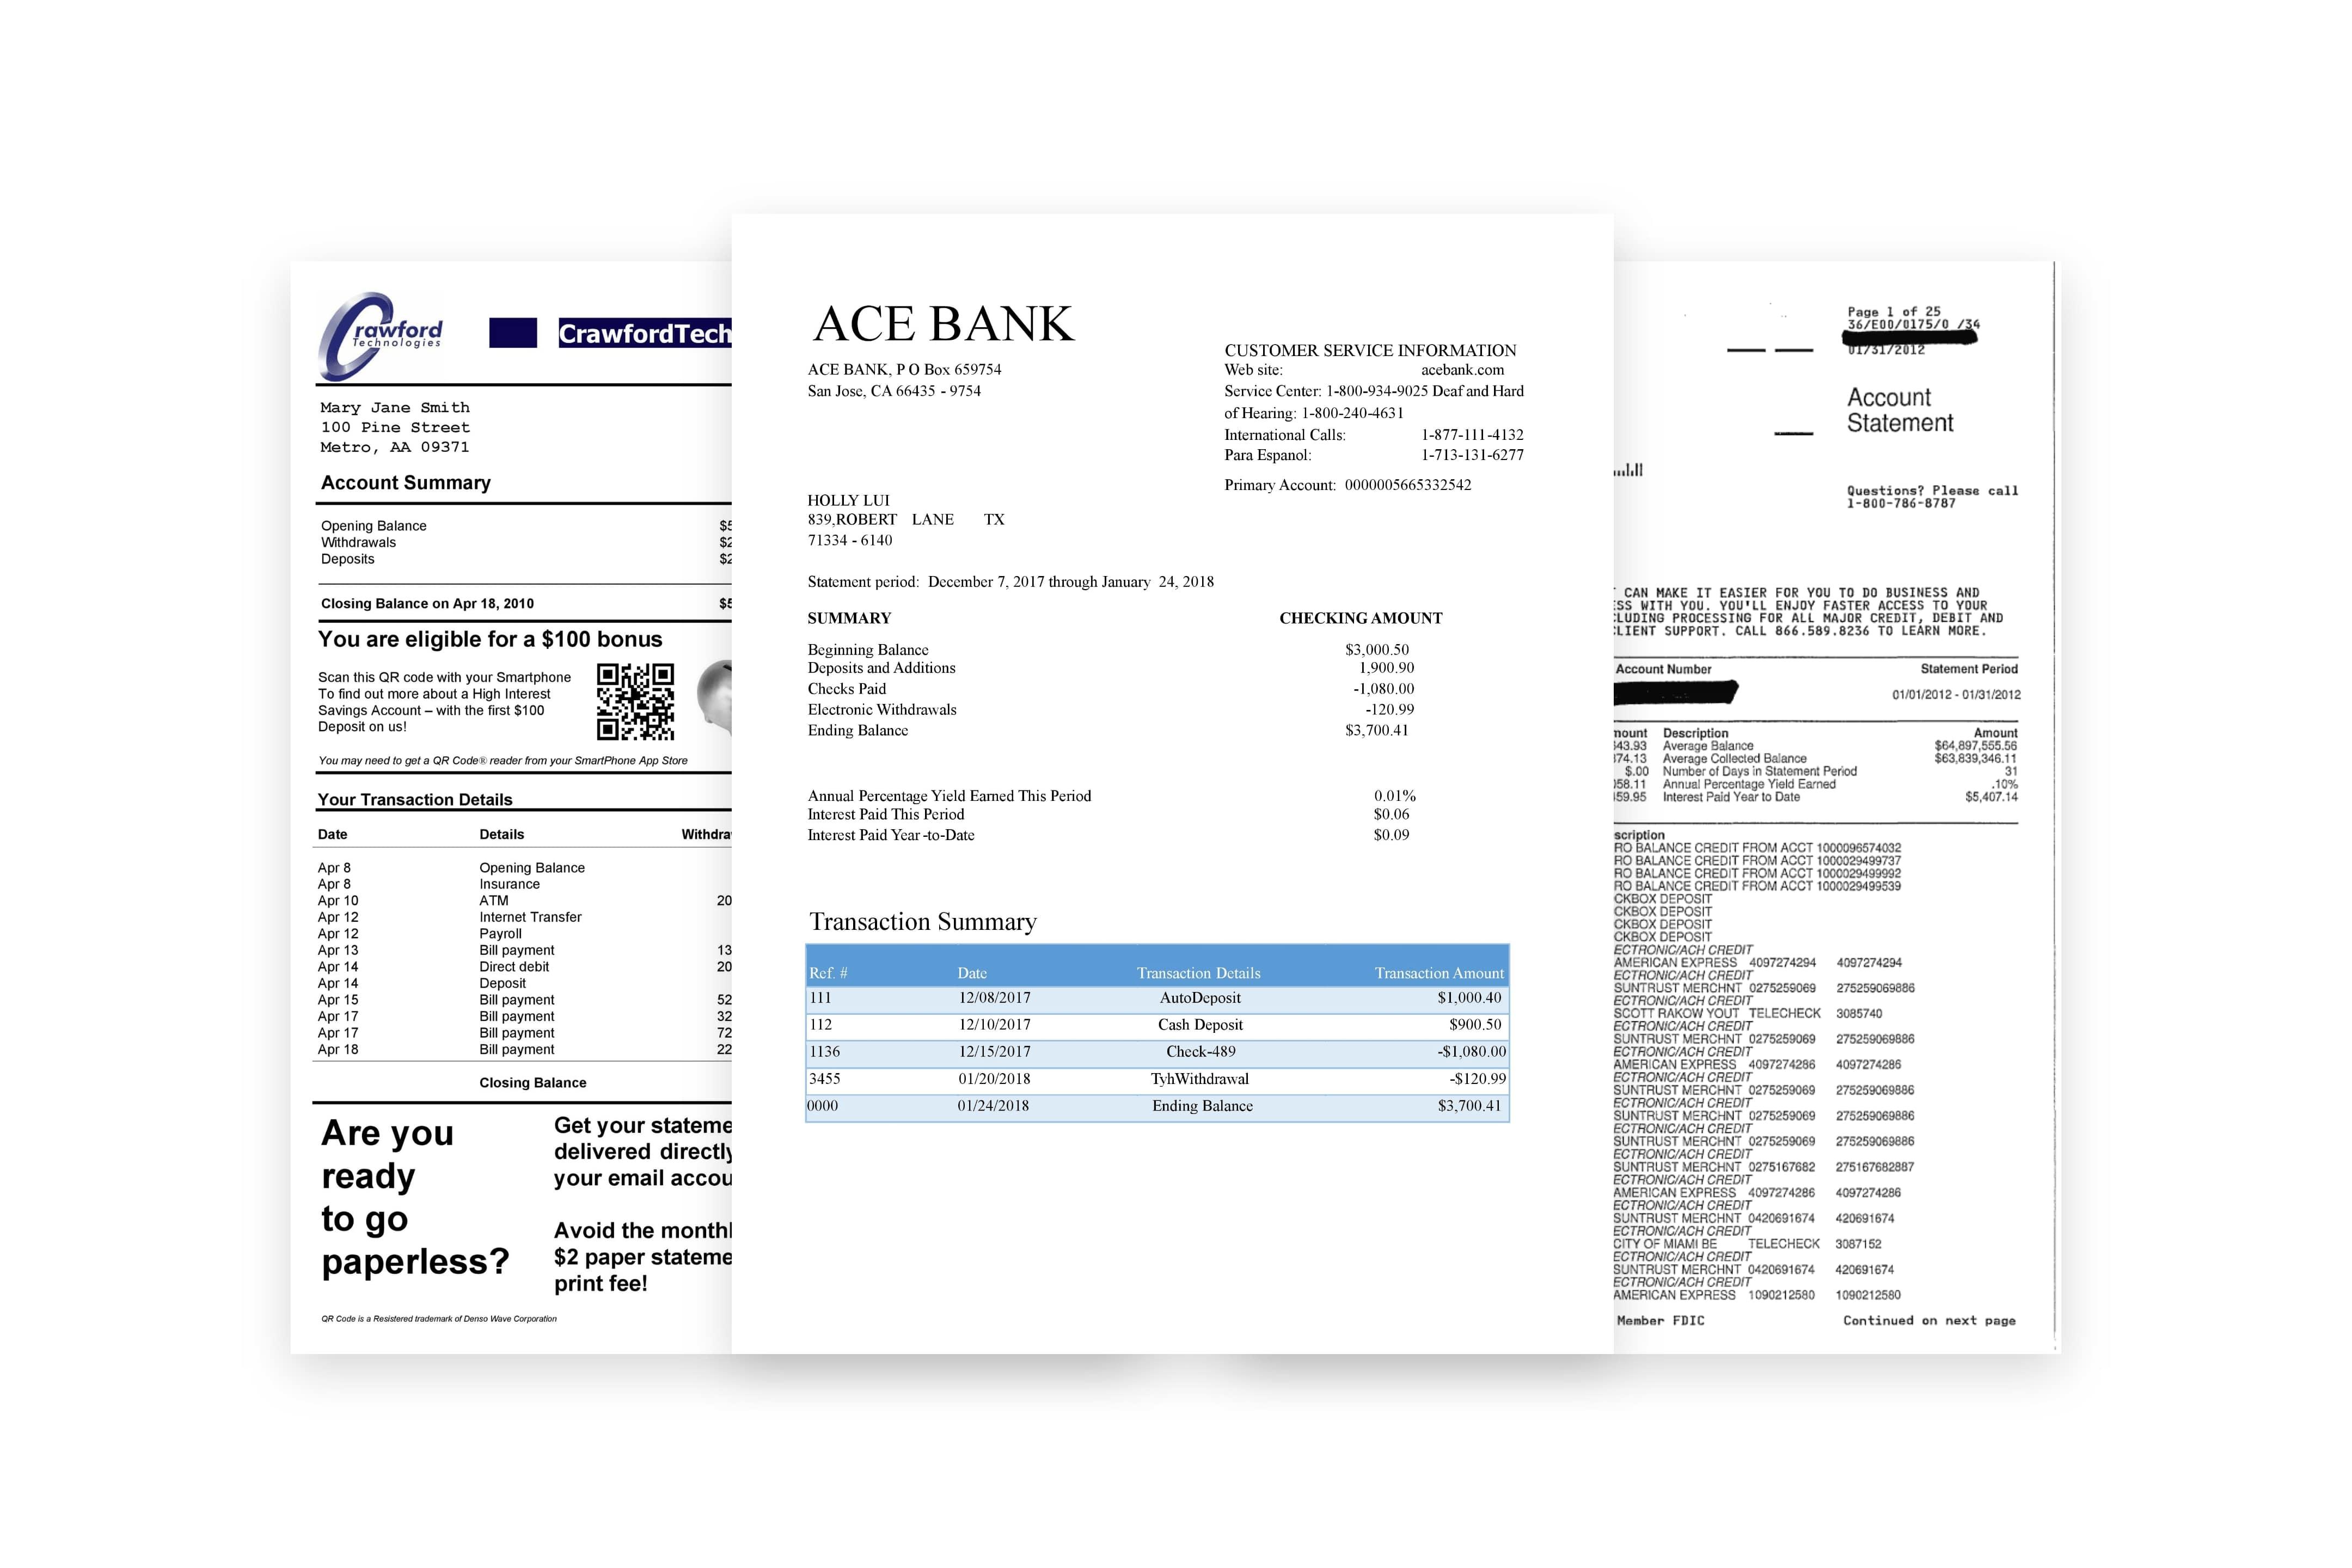 Bank Statement Processing